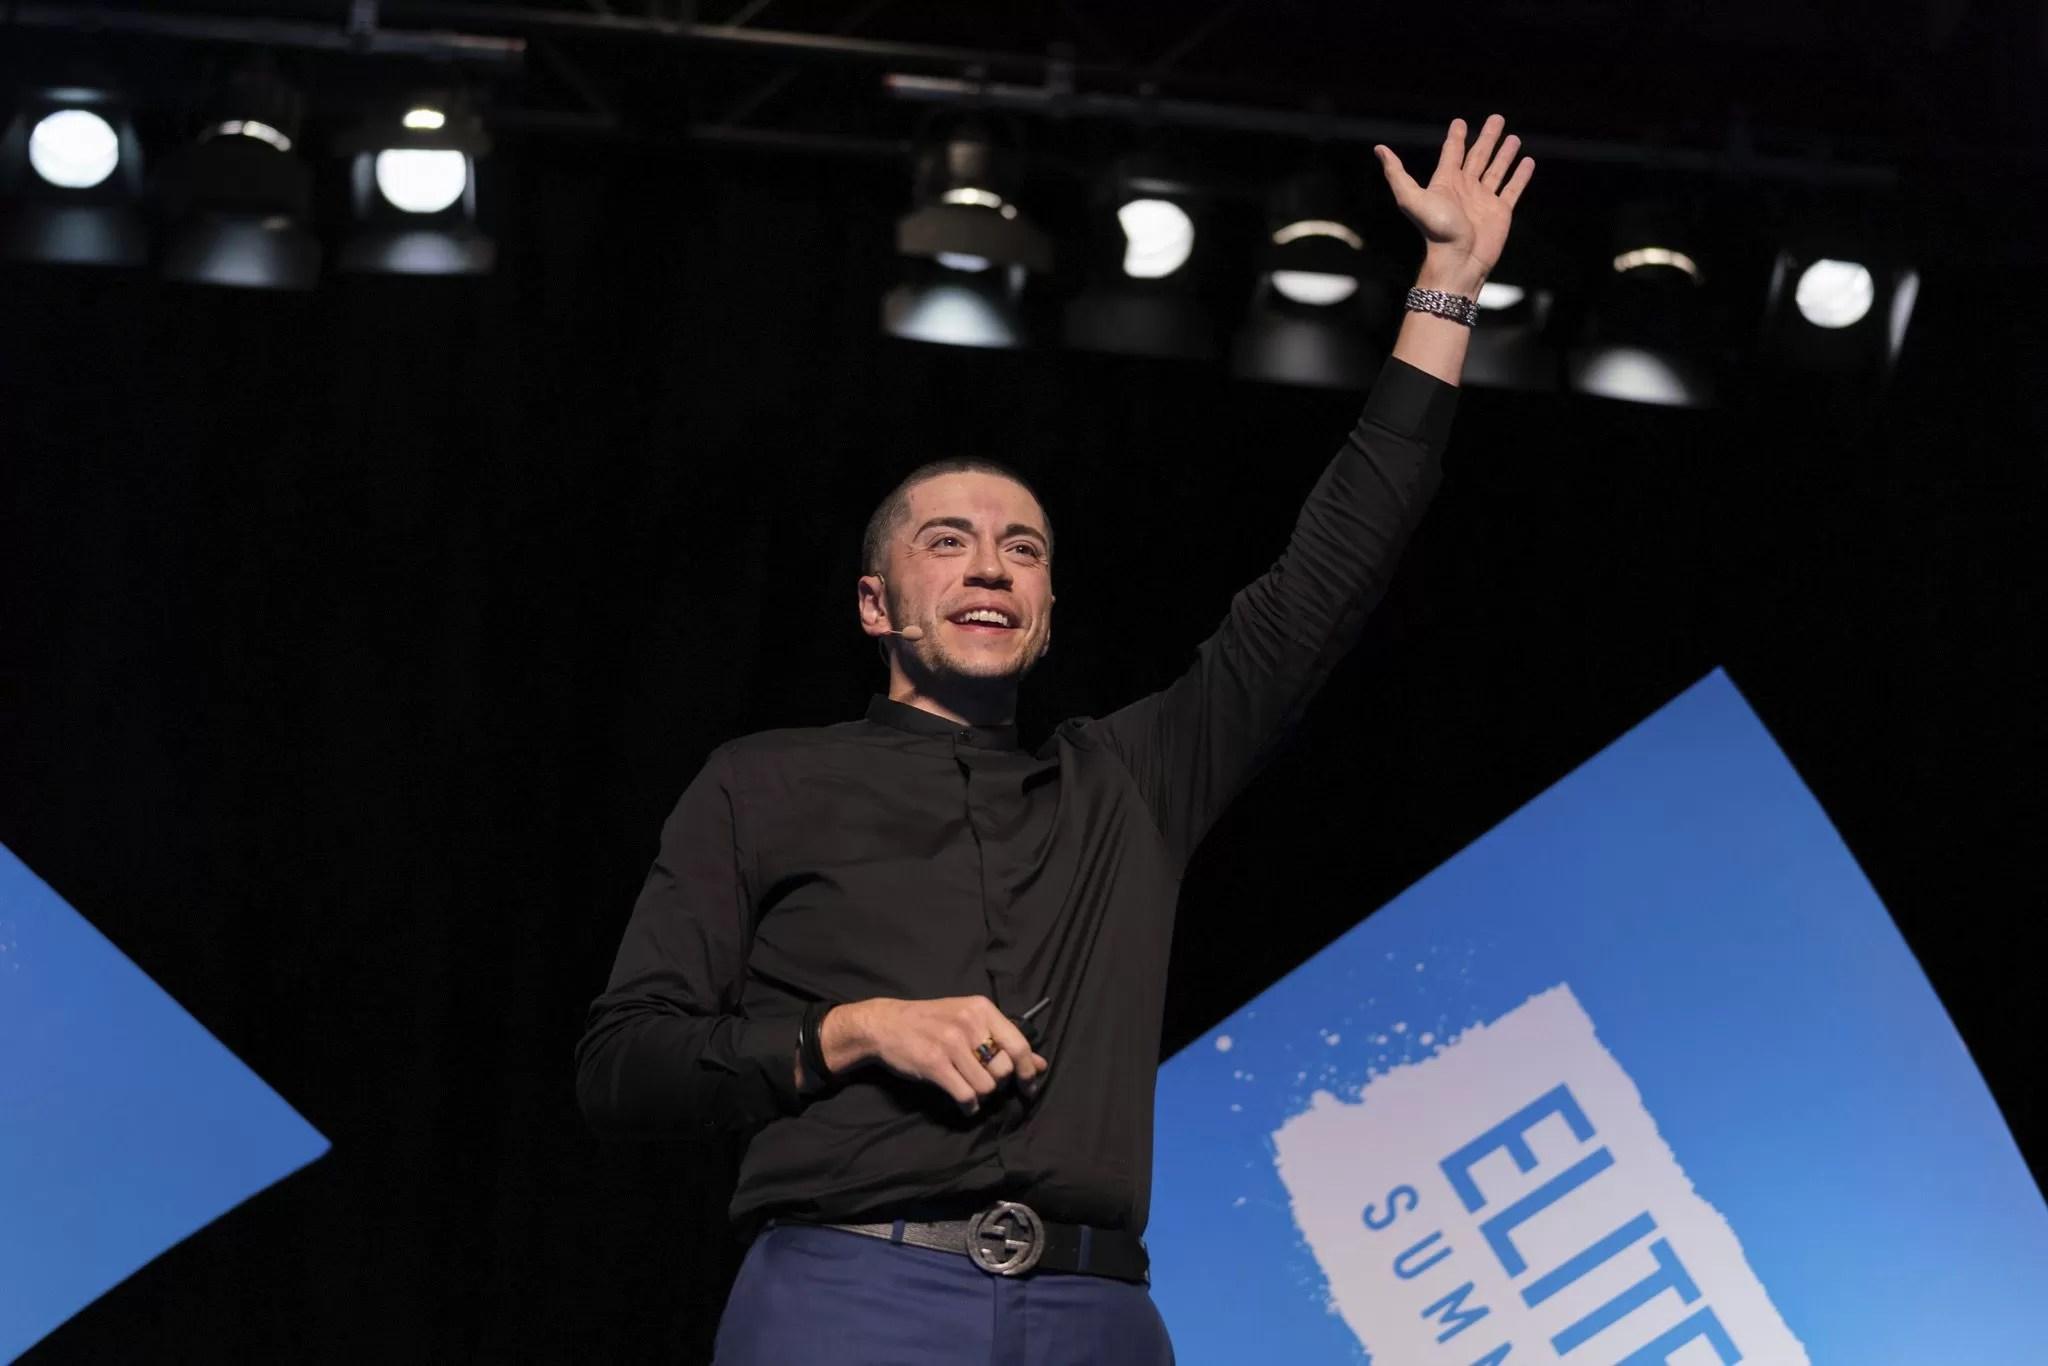 Josh-Elizetxe-The-Young-Entrepreneur1.jpg